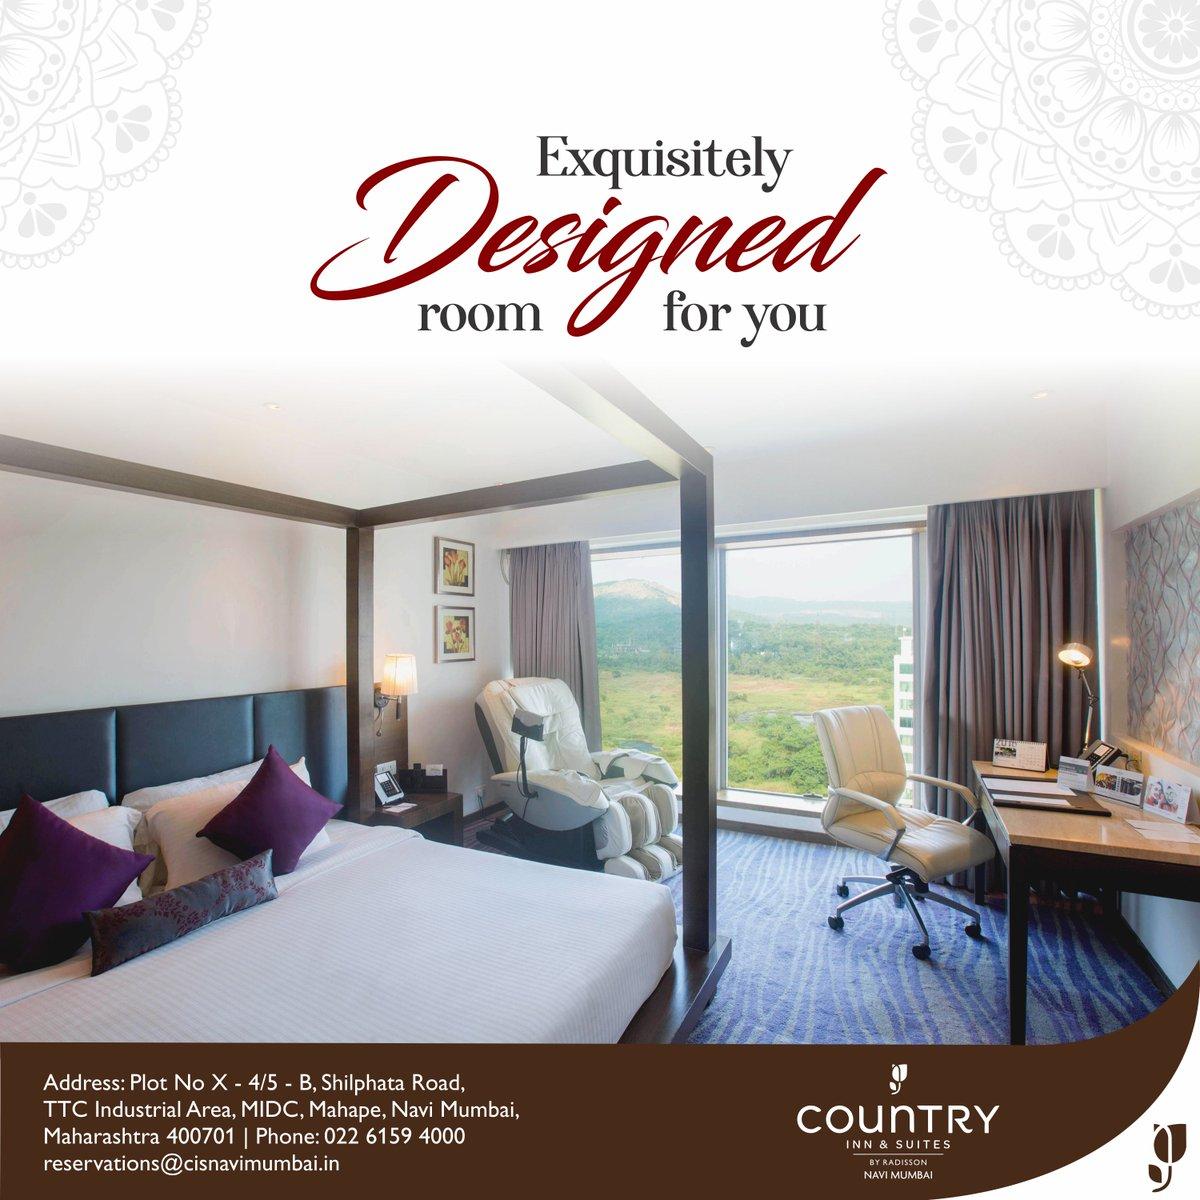 Country Inn Suites At Cisnavimumbai تويتر